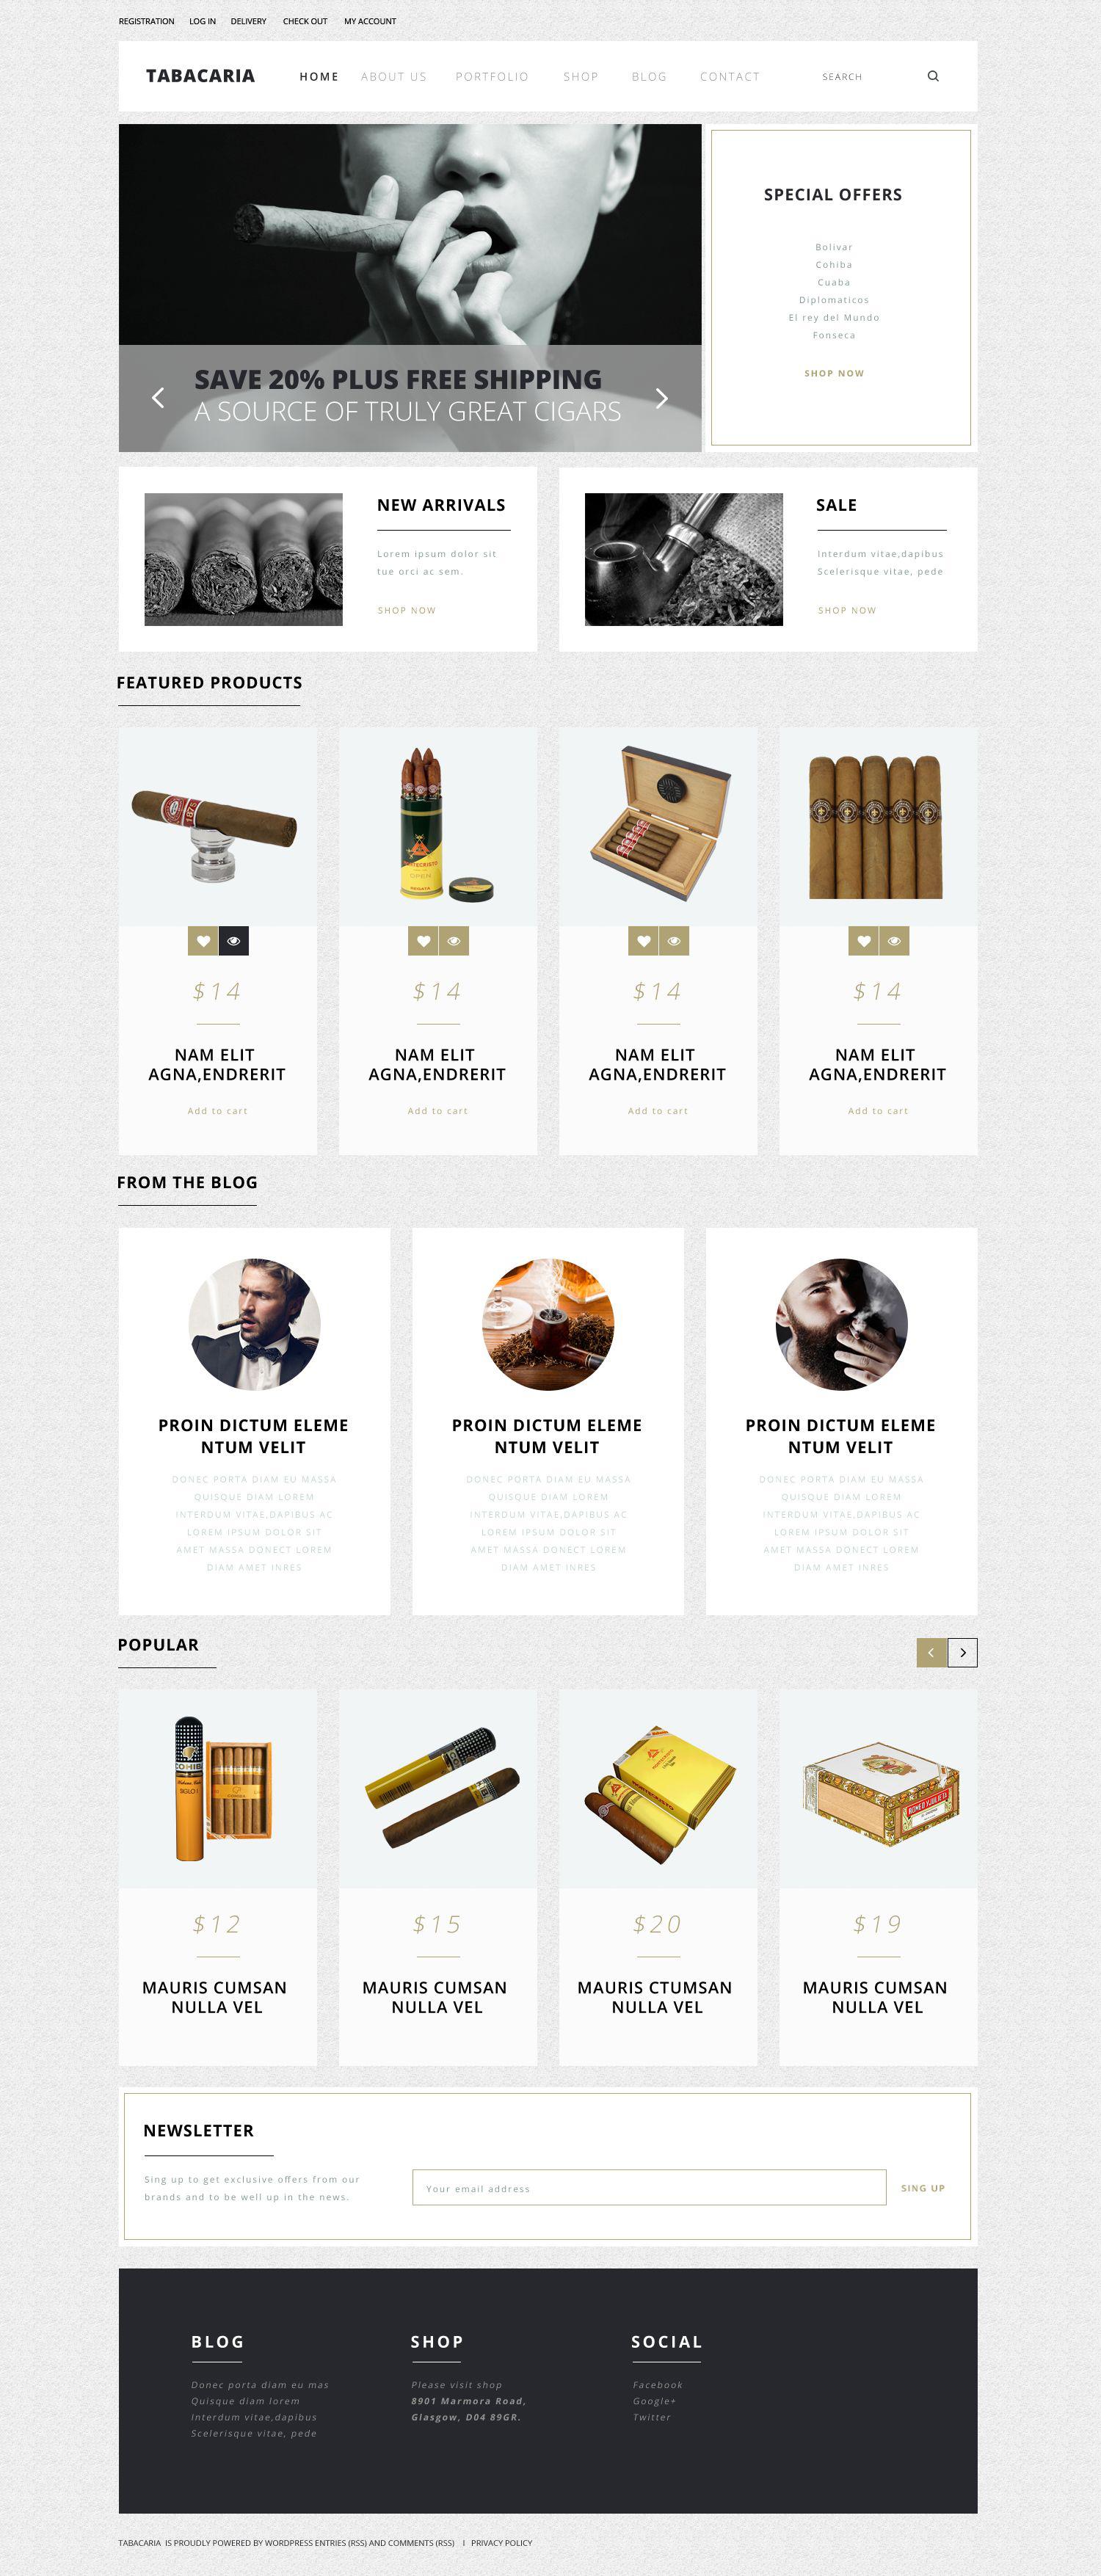 Tobacco Shop WooCommerce Theme